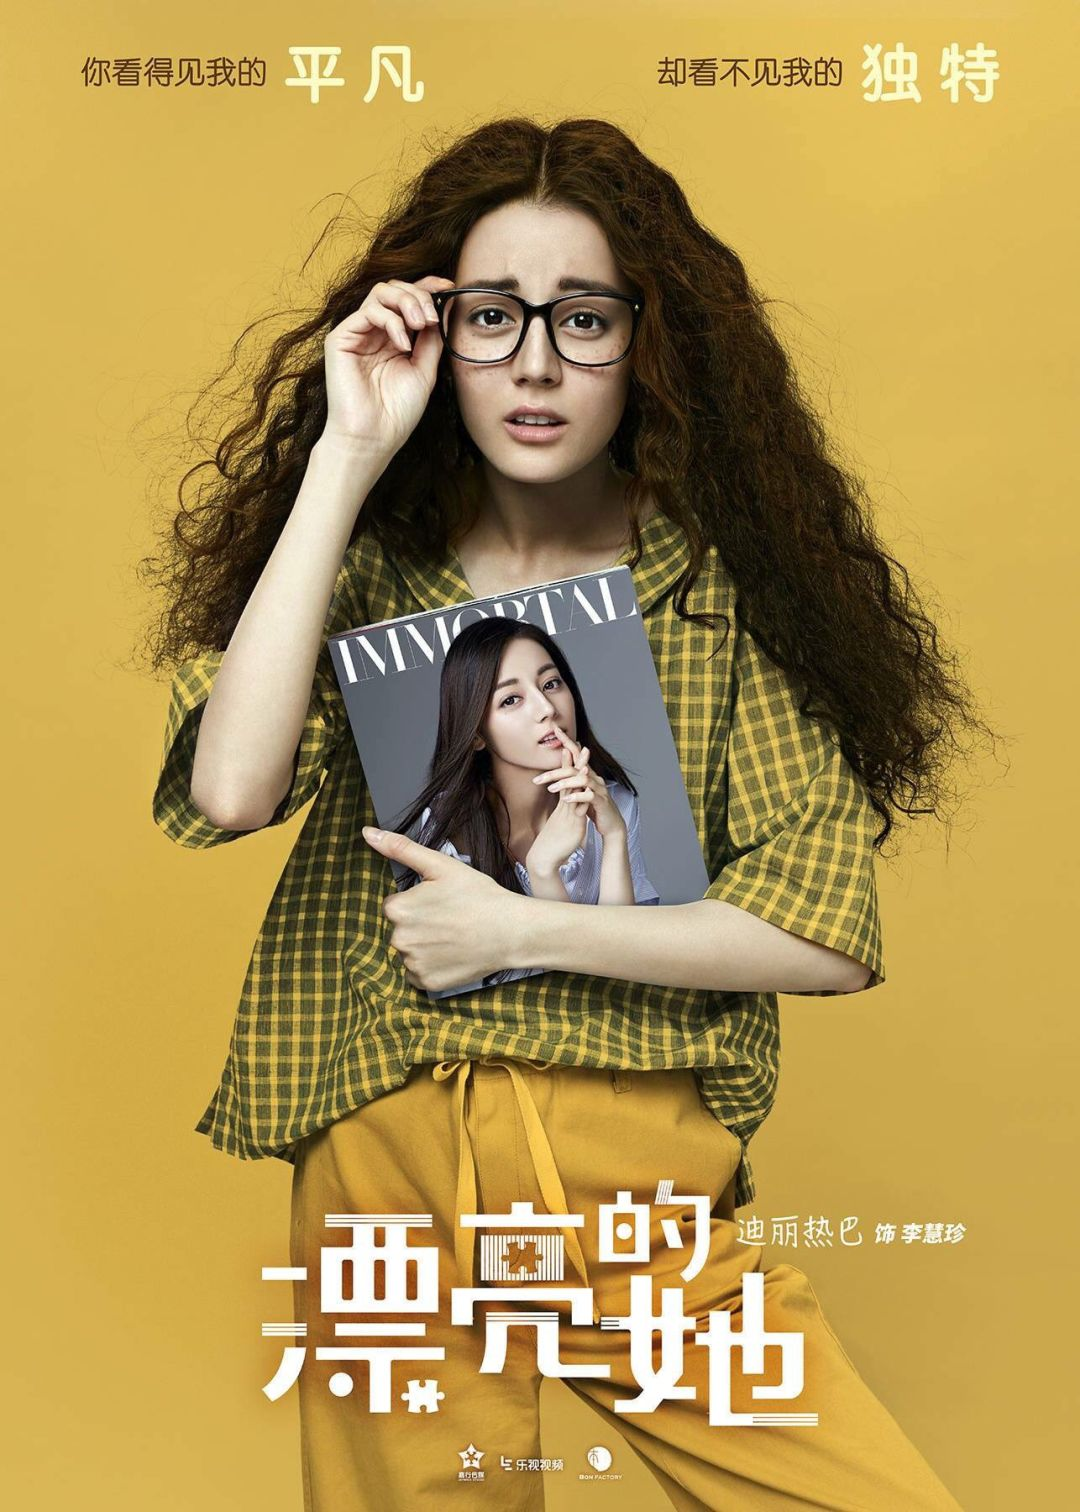 Dorama Prekrasnaya Li Huej Chzhen - Дорама: Прекрасная Ли Хуэй Чжэнь